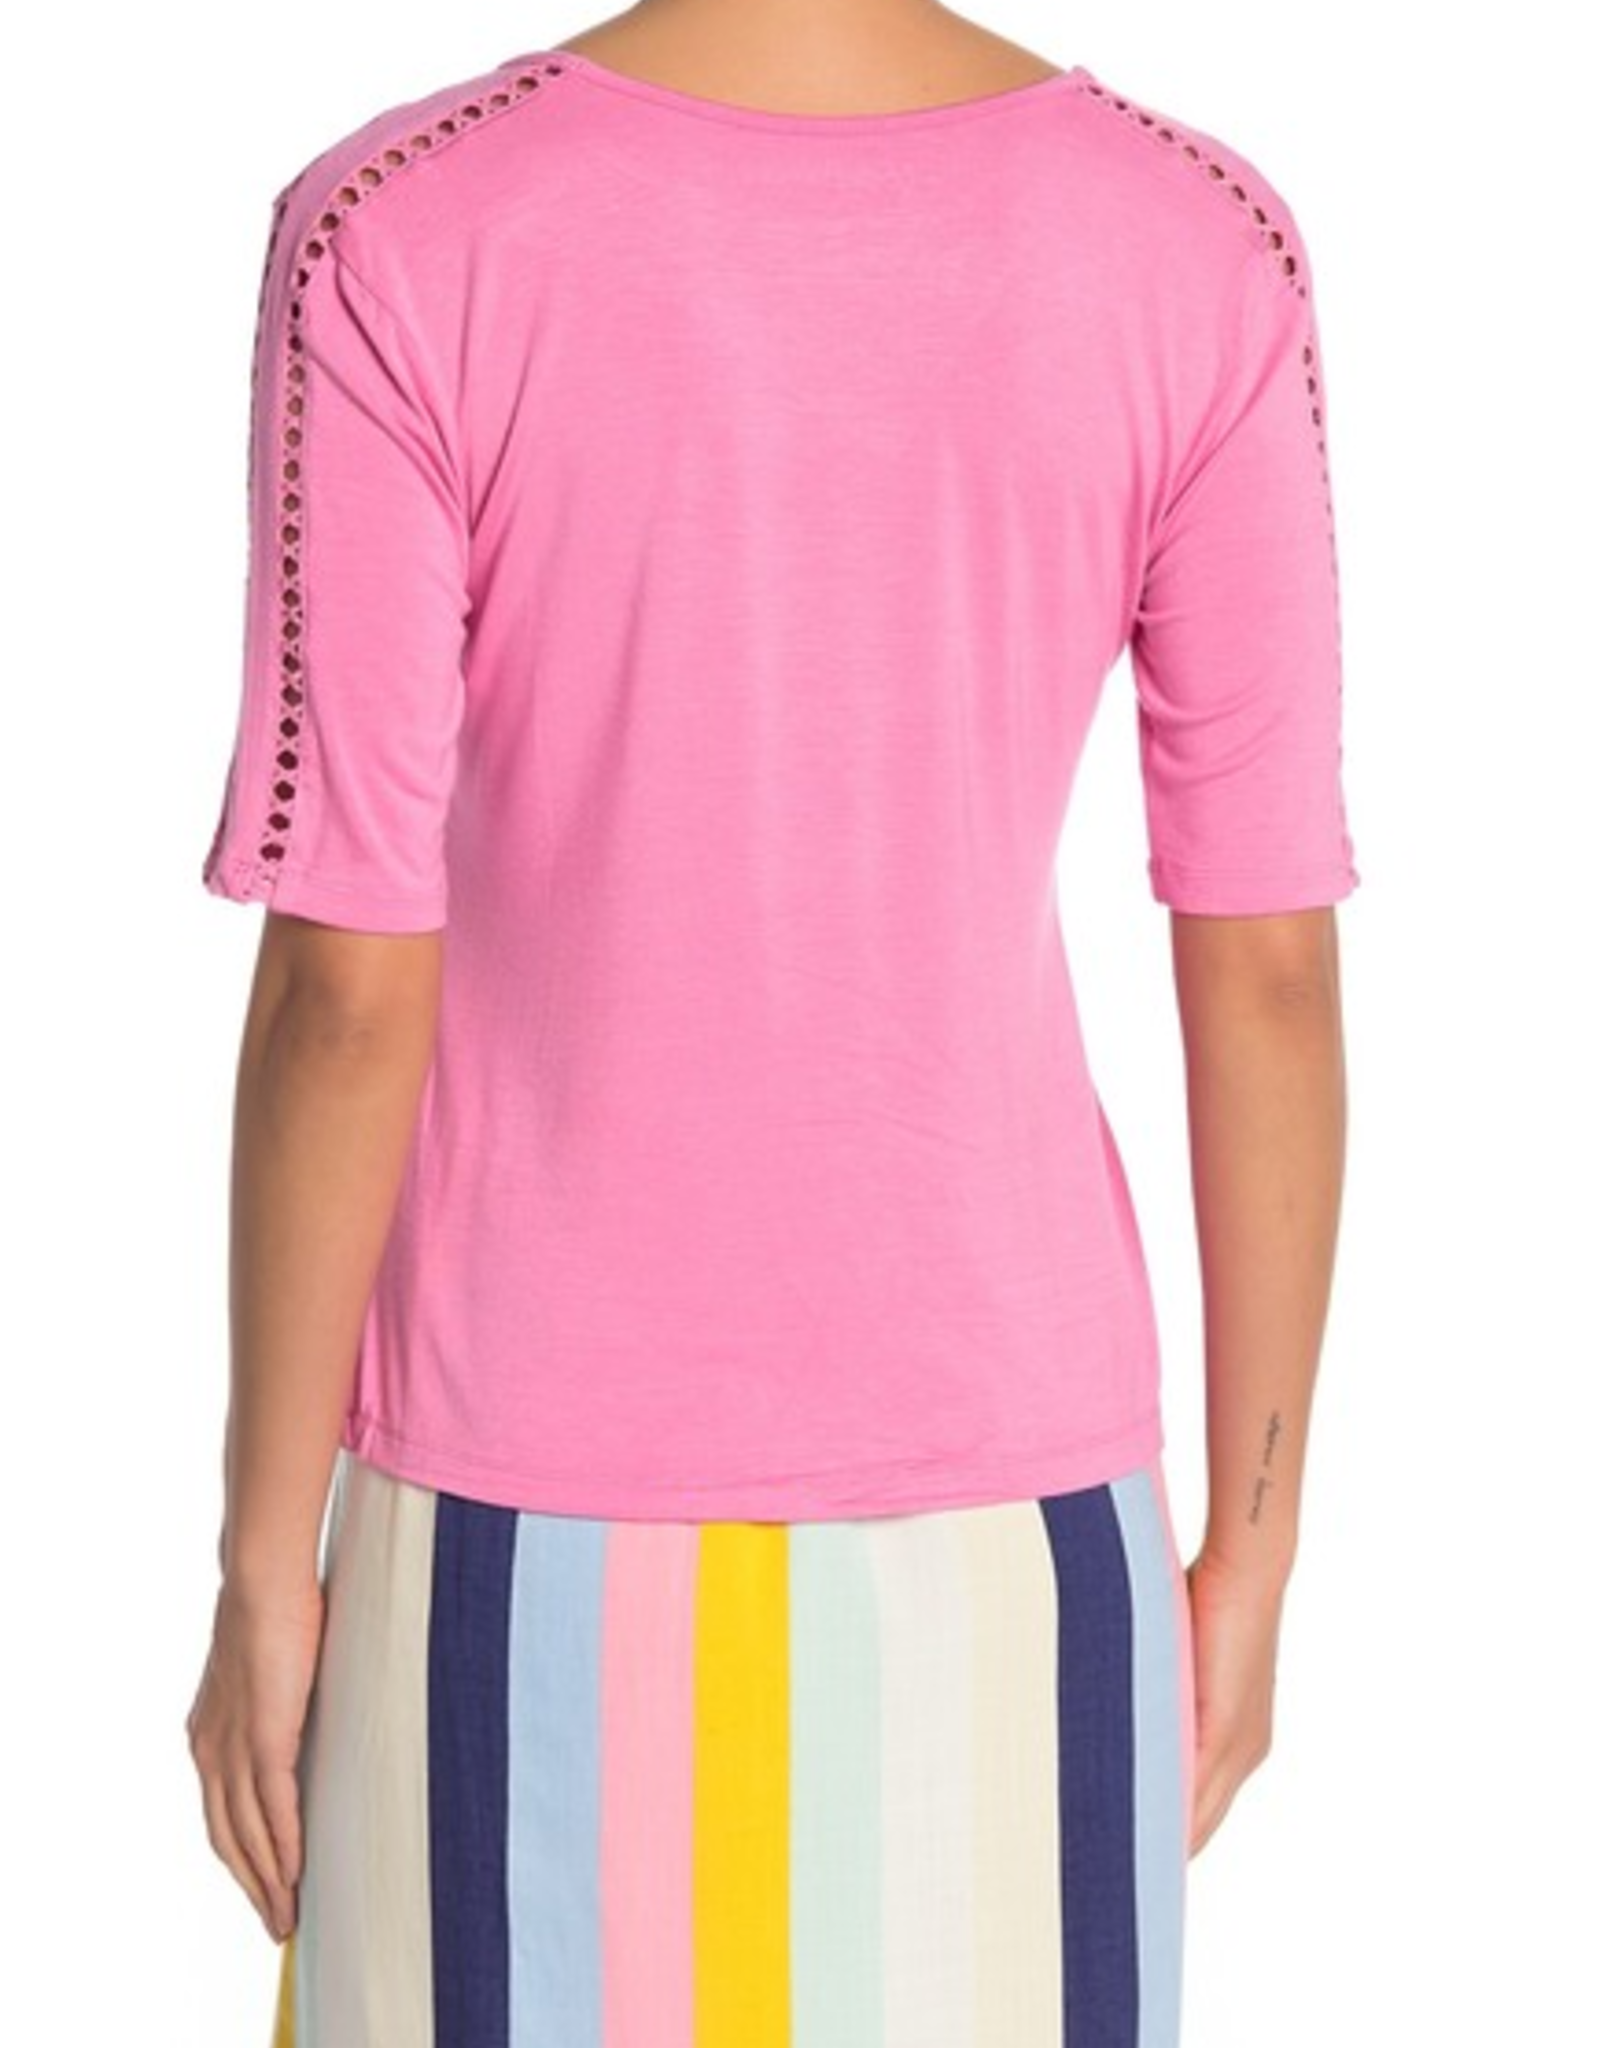 Catherine Malandrino Catherine Maladrino Cutout Trim T-Shirt Sz L